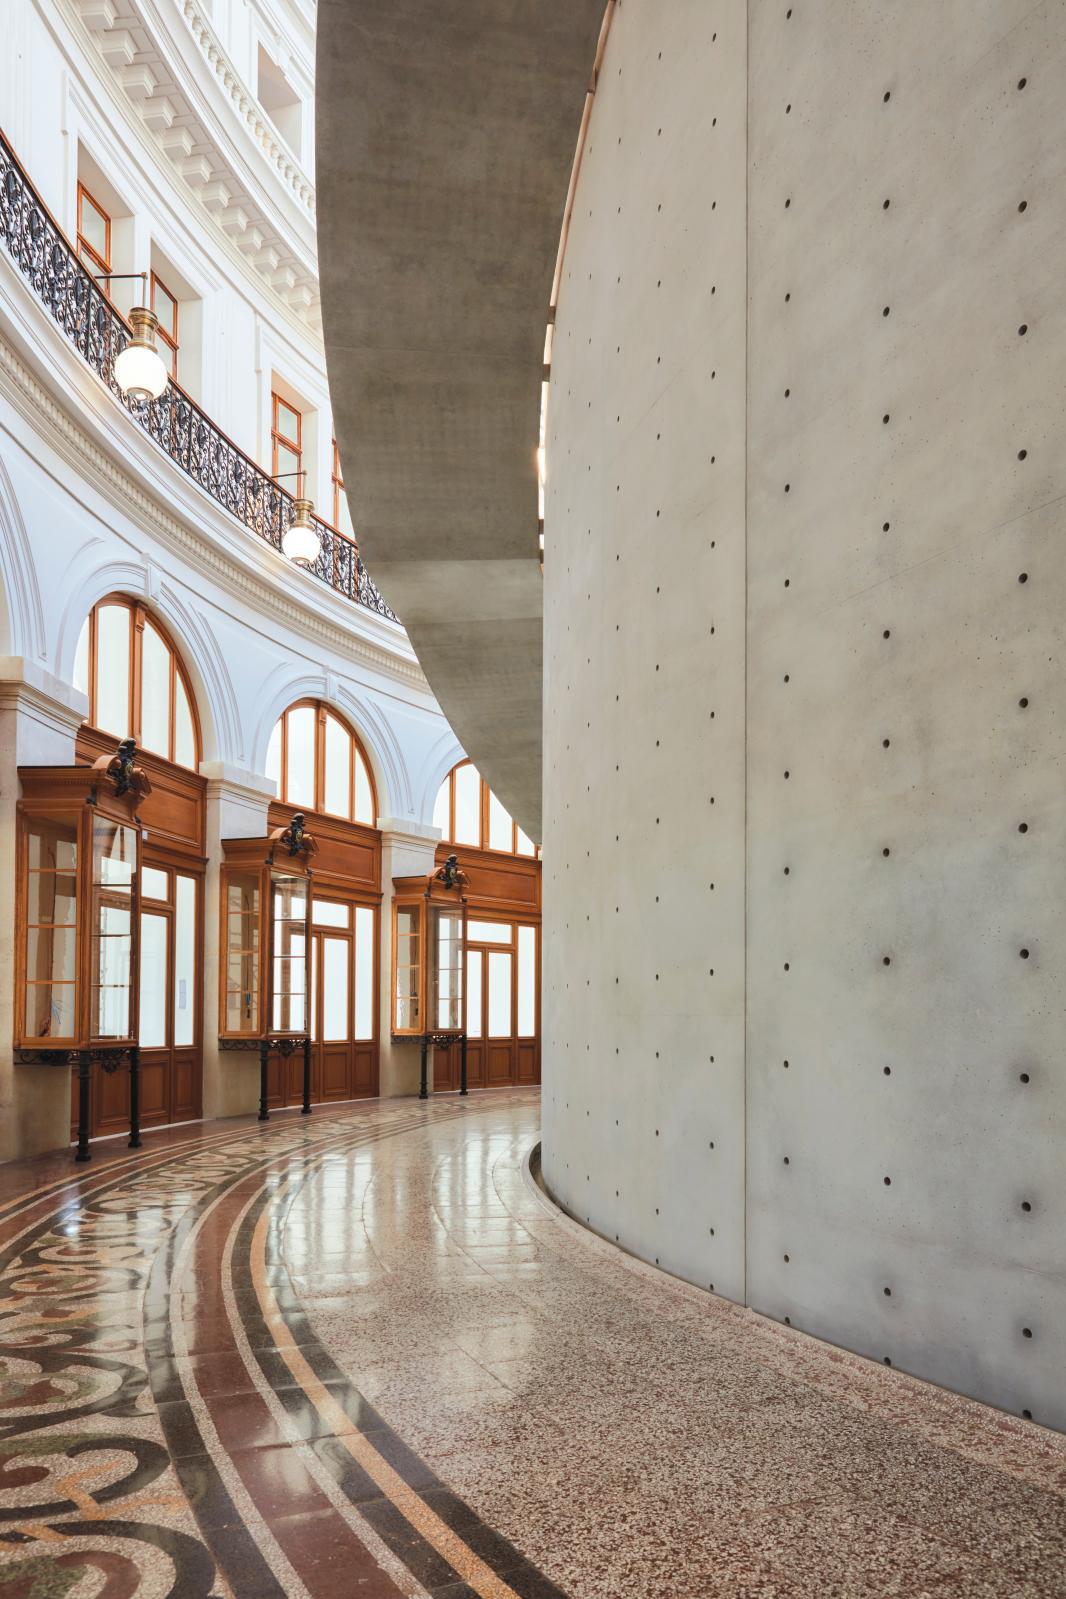 Bourse de Commerce - Pinault Collection Tadao Ando Architect & Associates, Niney & Marca Architectes, Agence Pierre-Antoine Gatier. Photo: Marc Domage